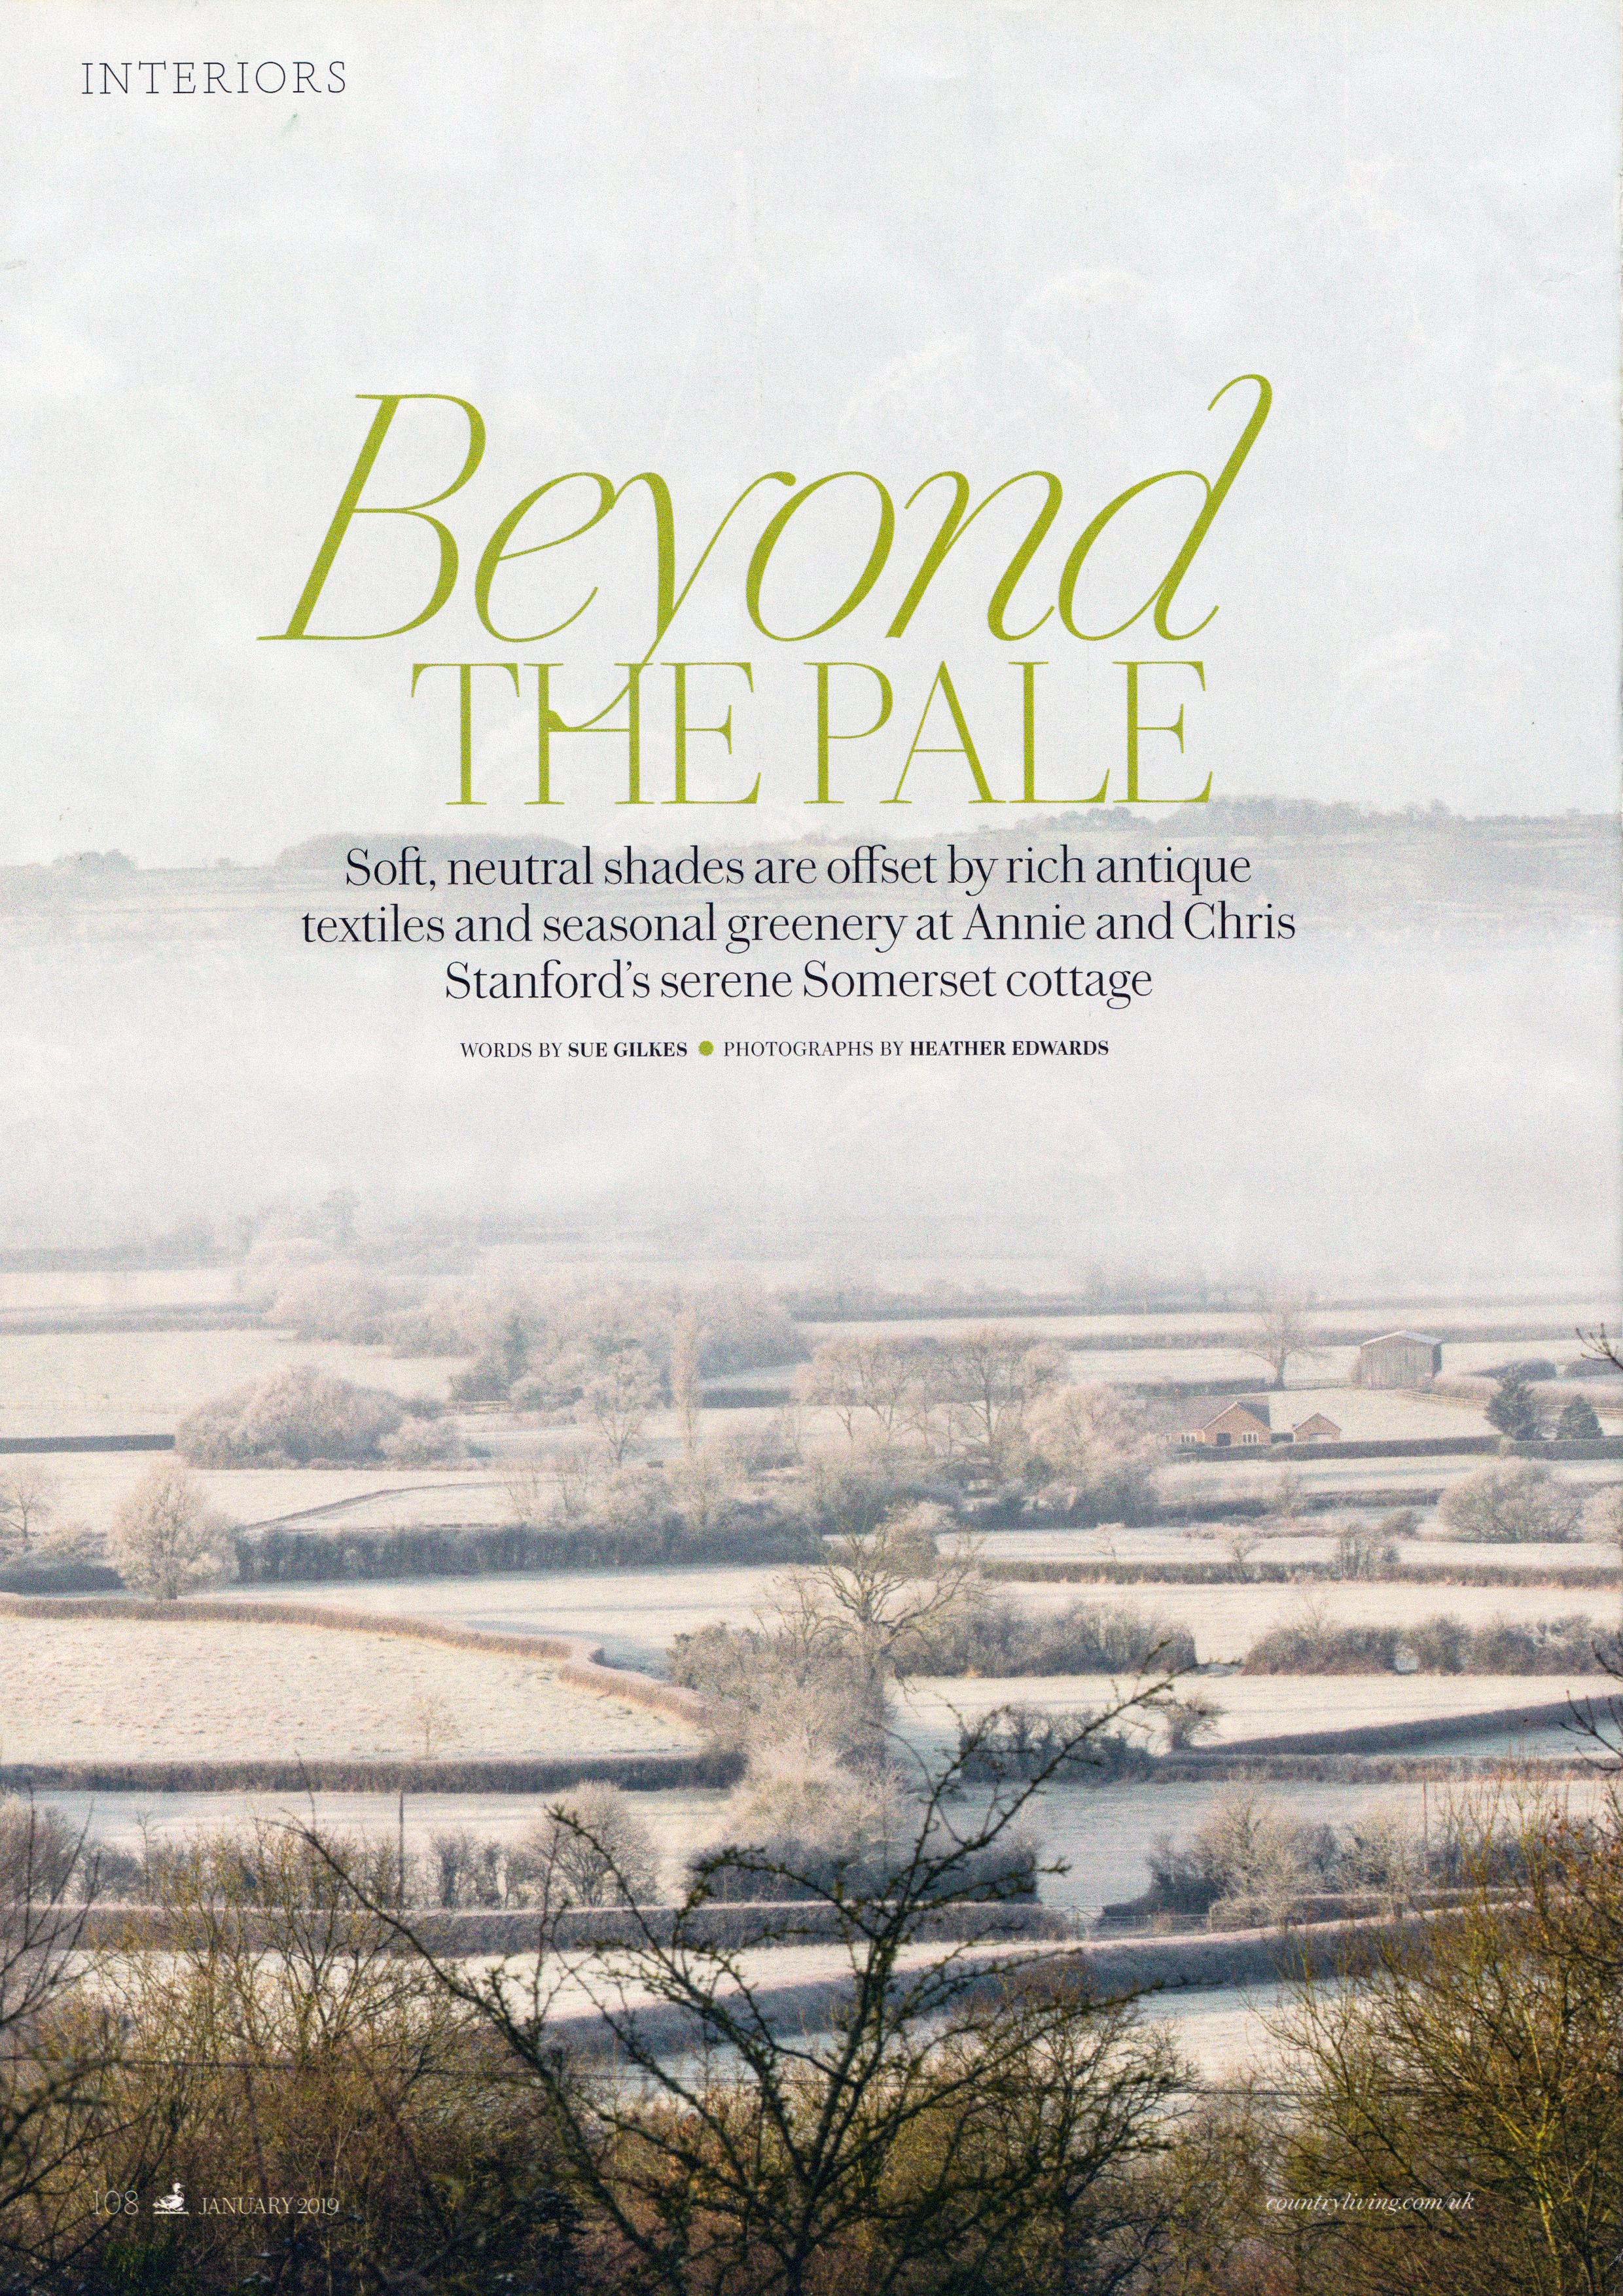 Country Living - Beyond The Pale - Jan 2019.jpg